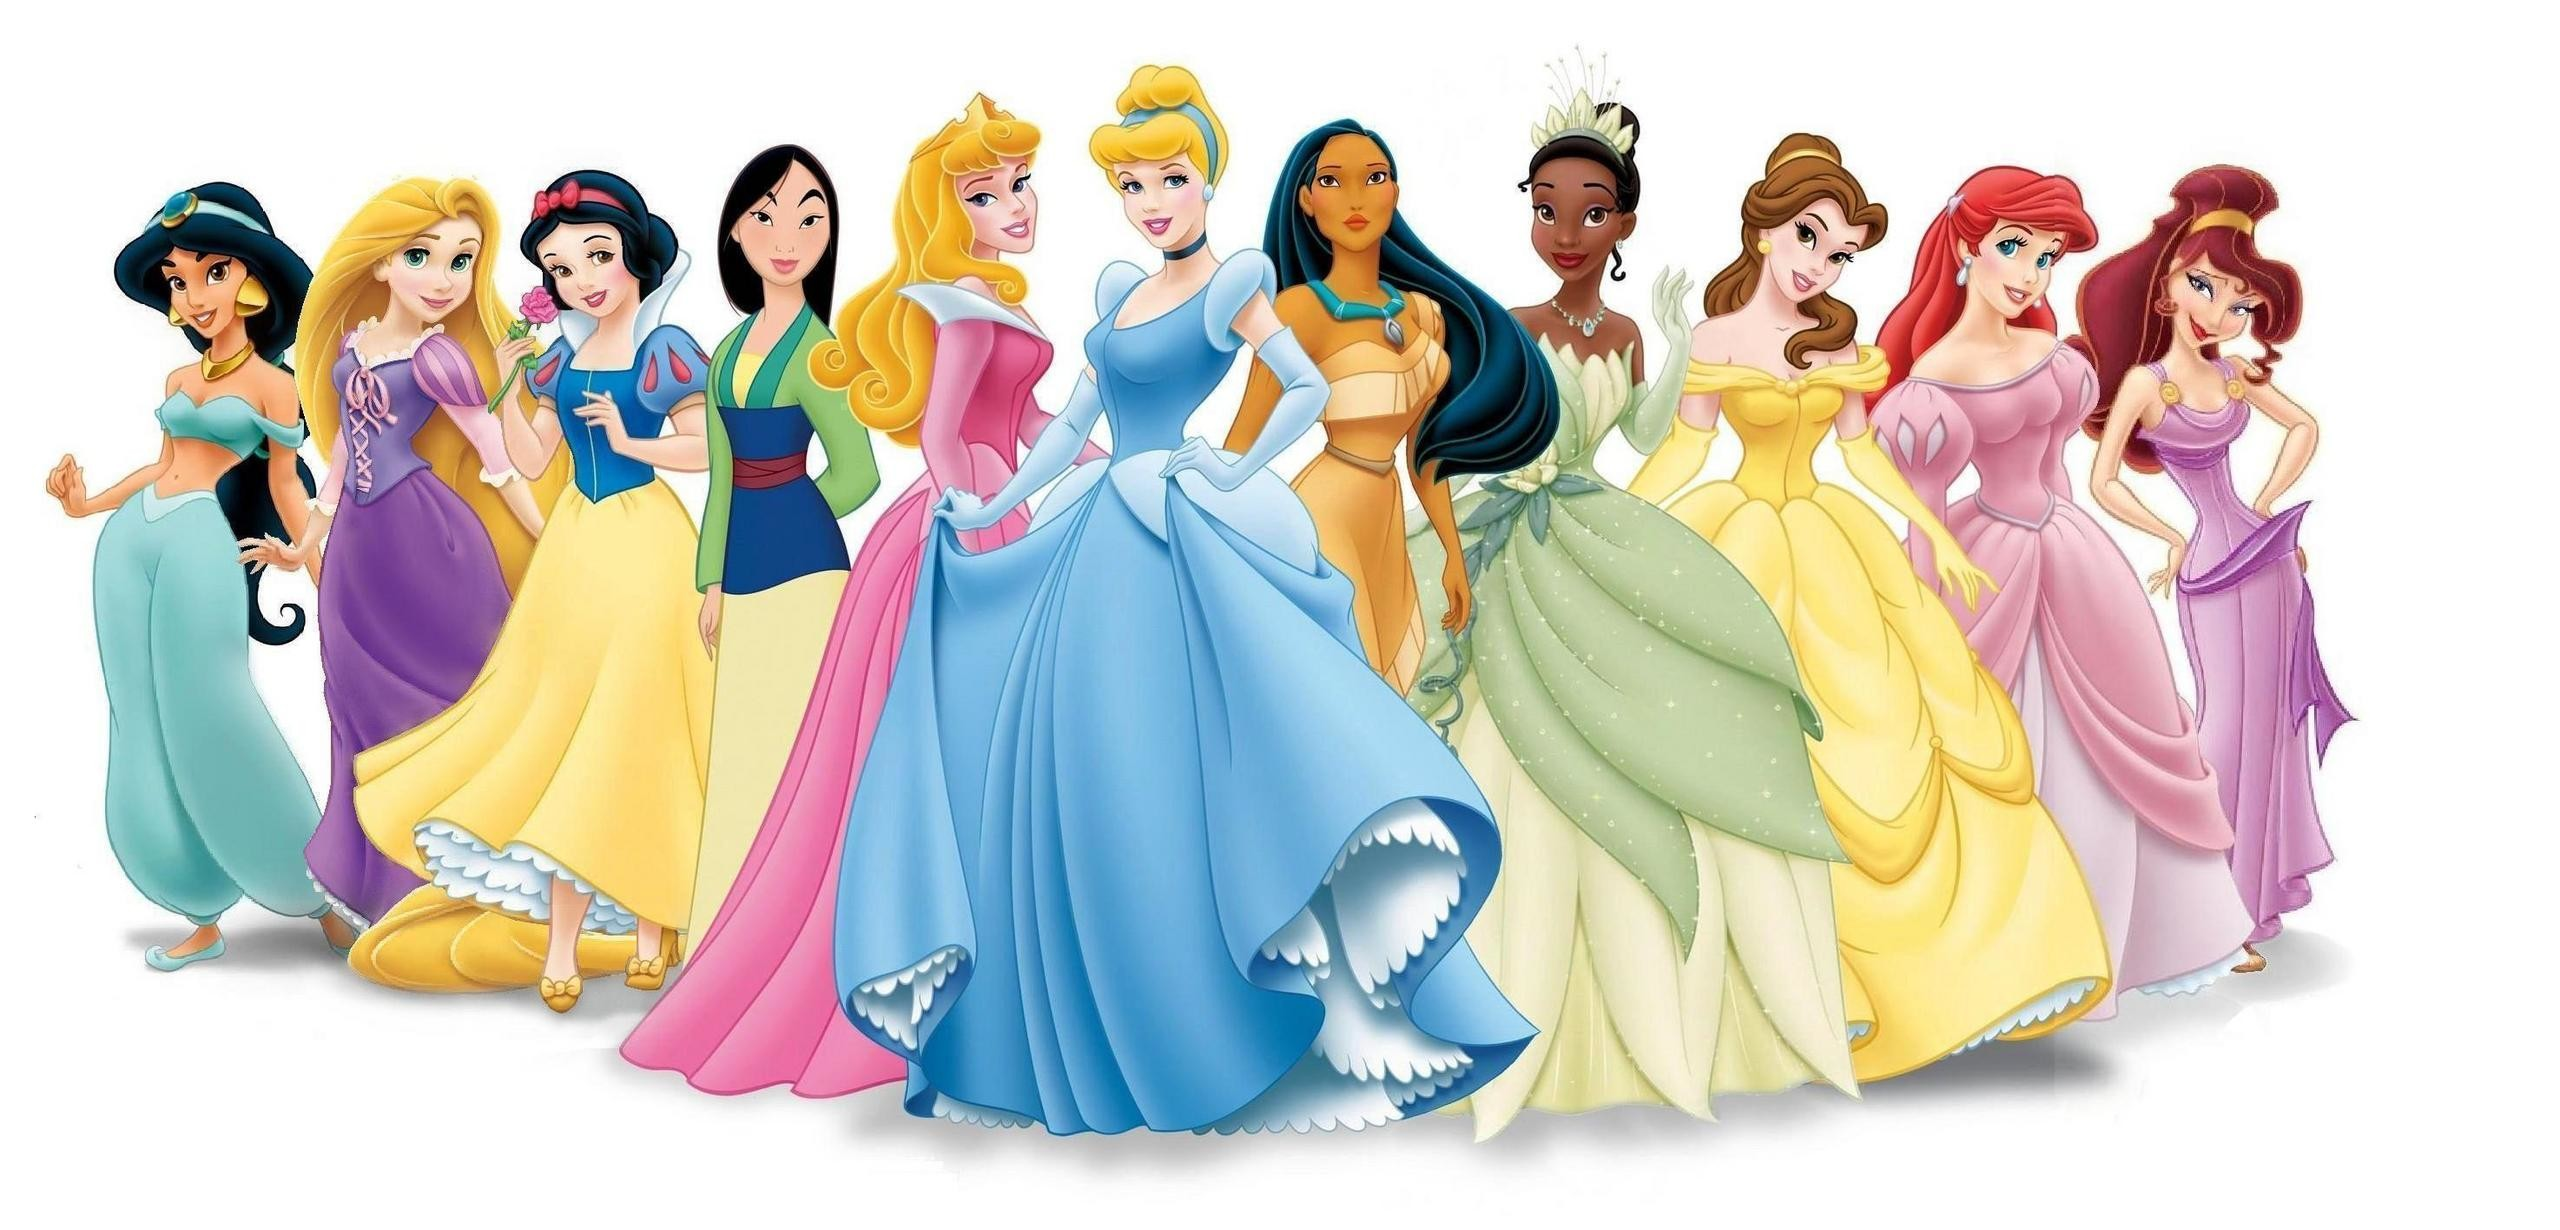 Disney Princess Castle Wallpaper Xxl - Meg A Disney Princess - HD Wallpaper